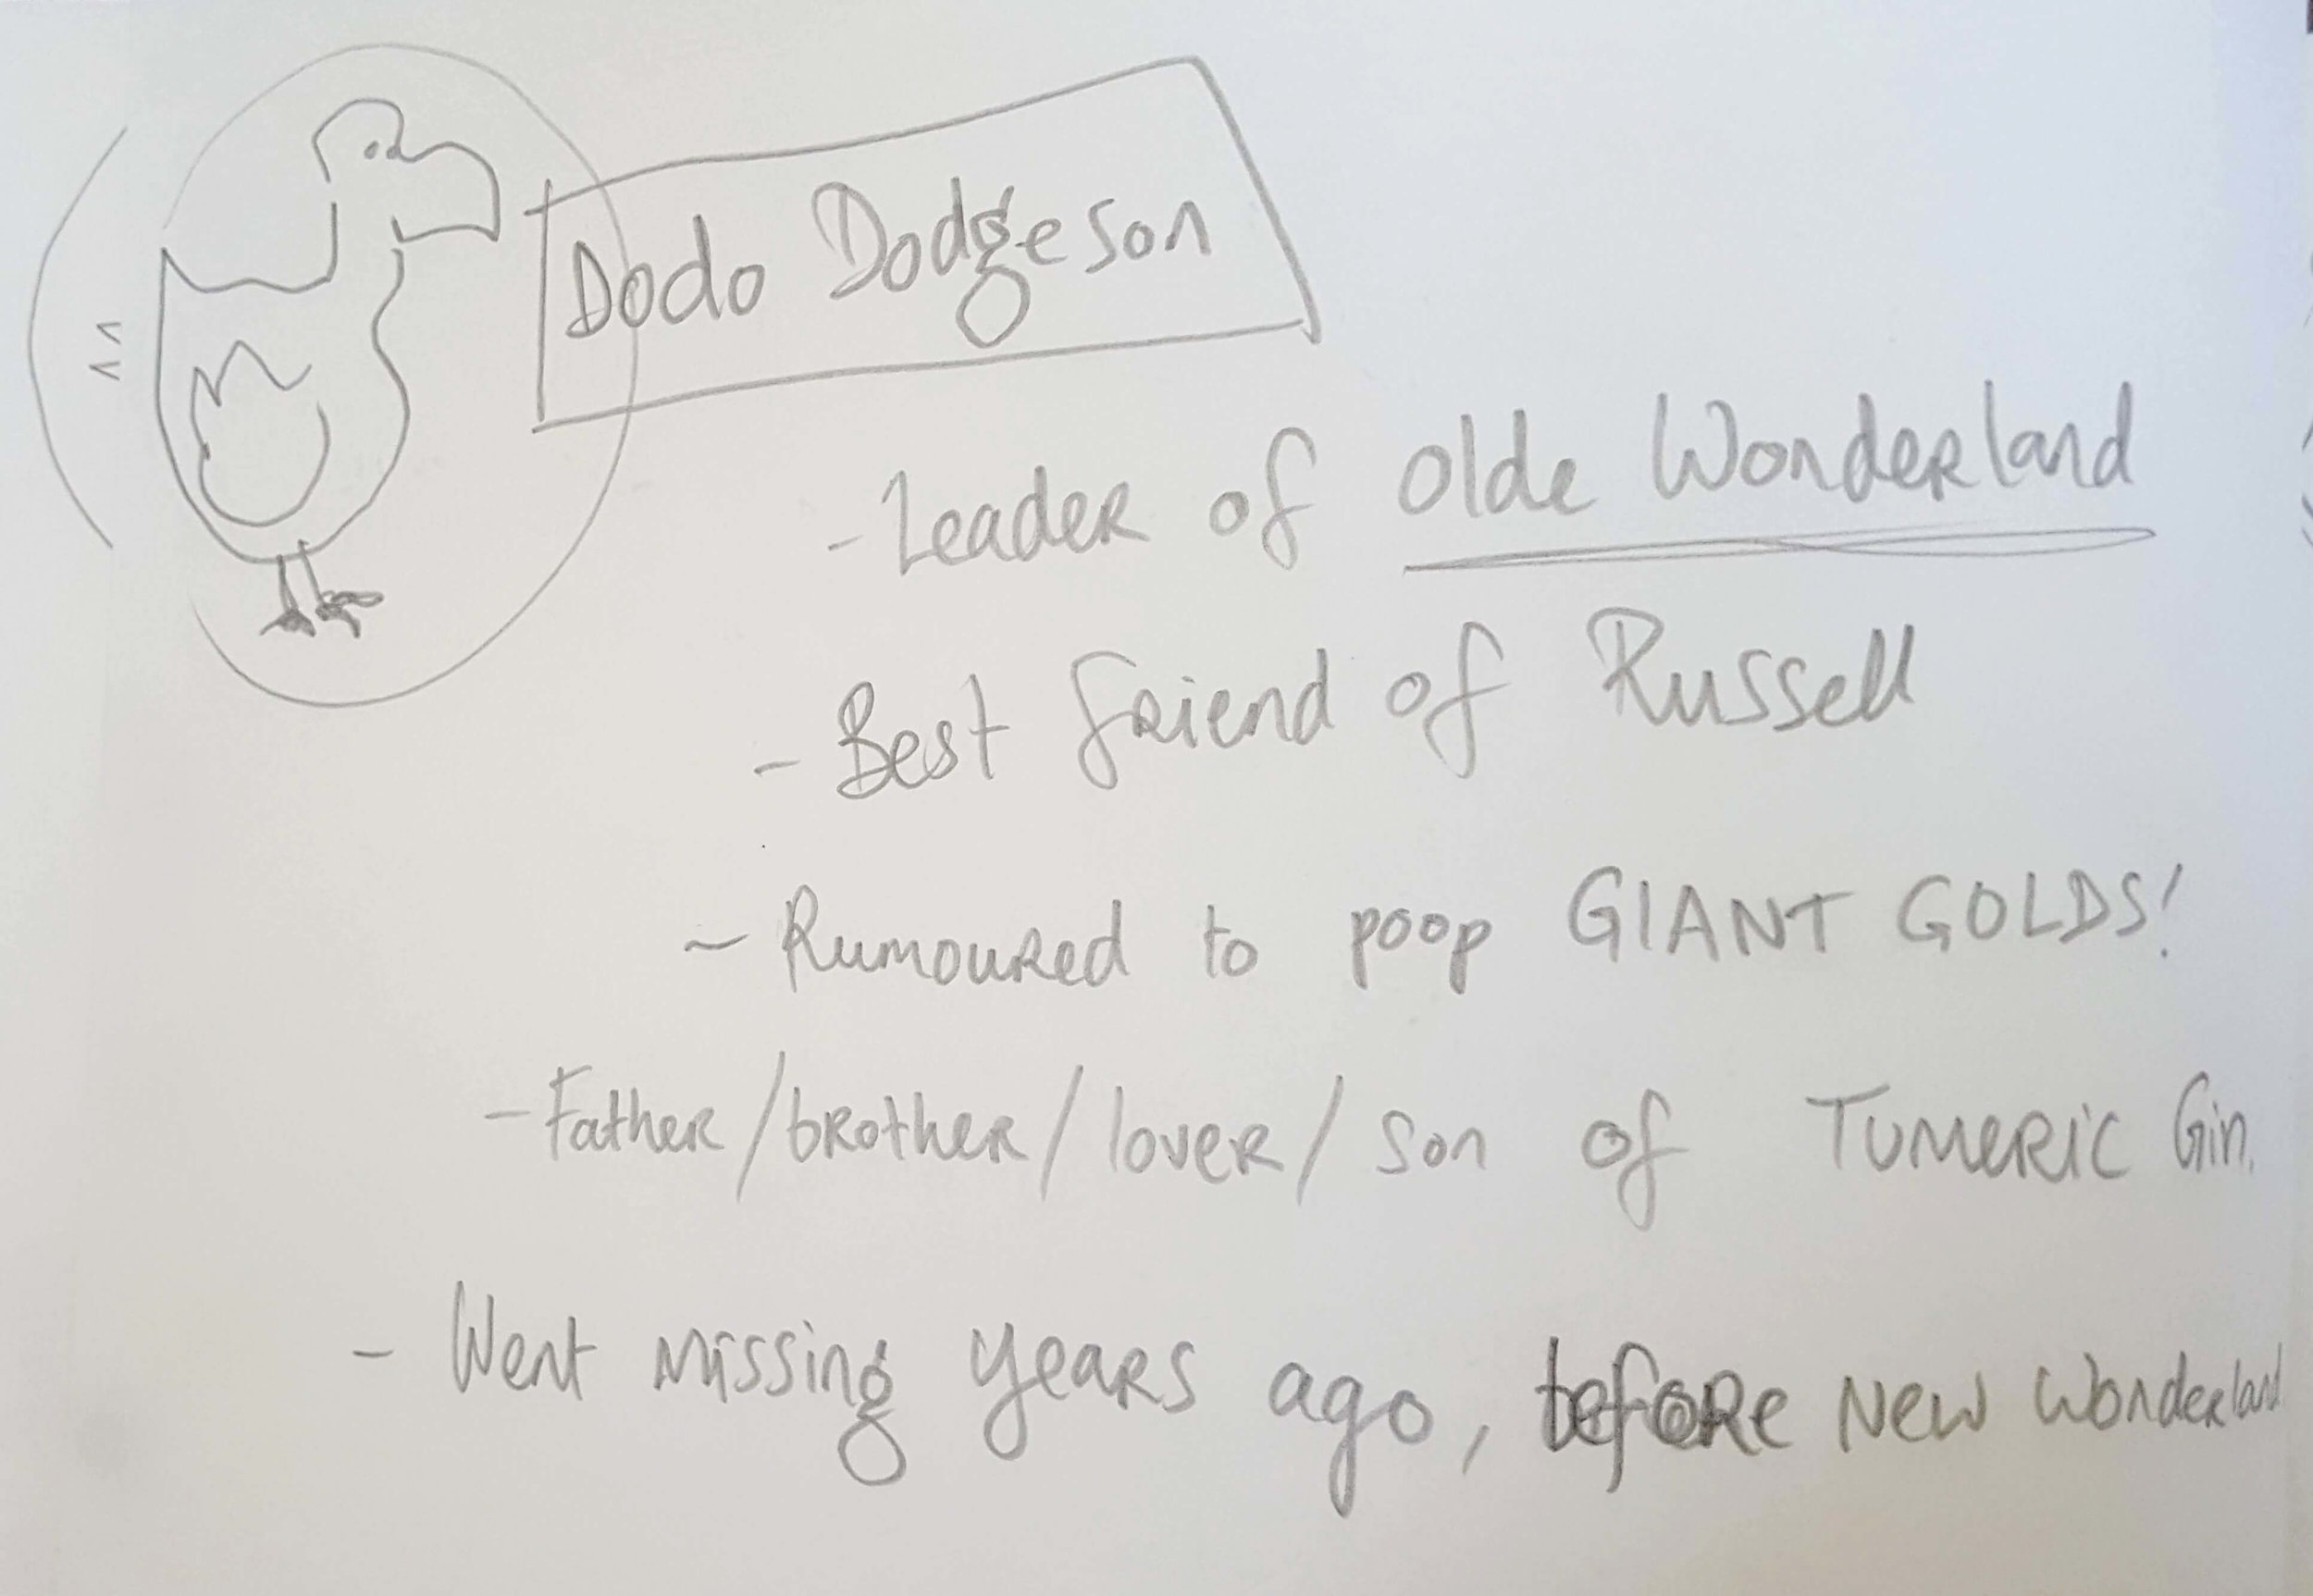 dodo dodgeson